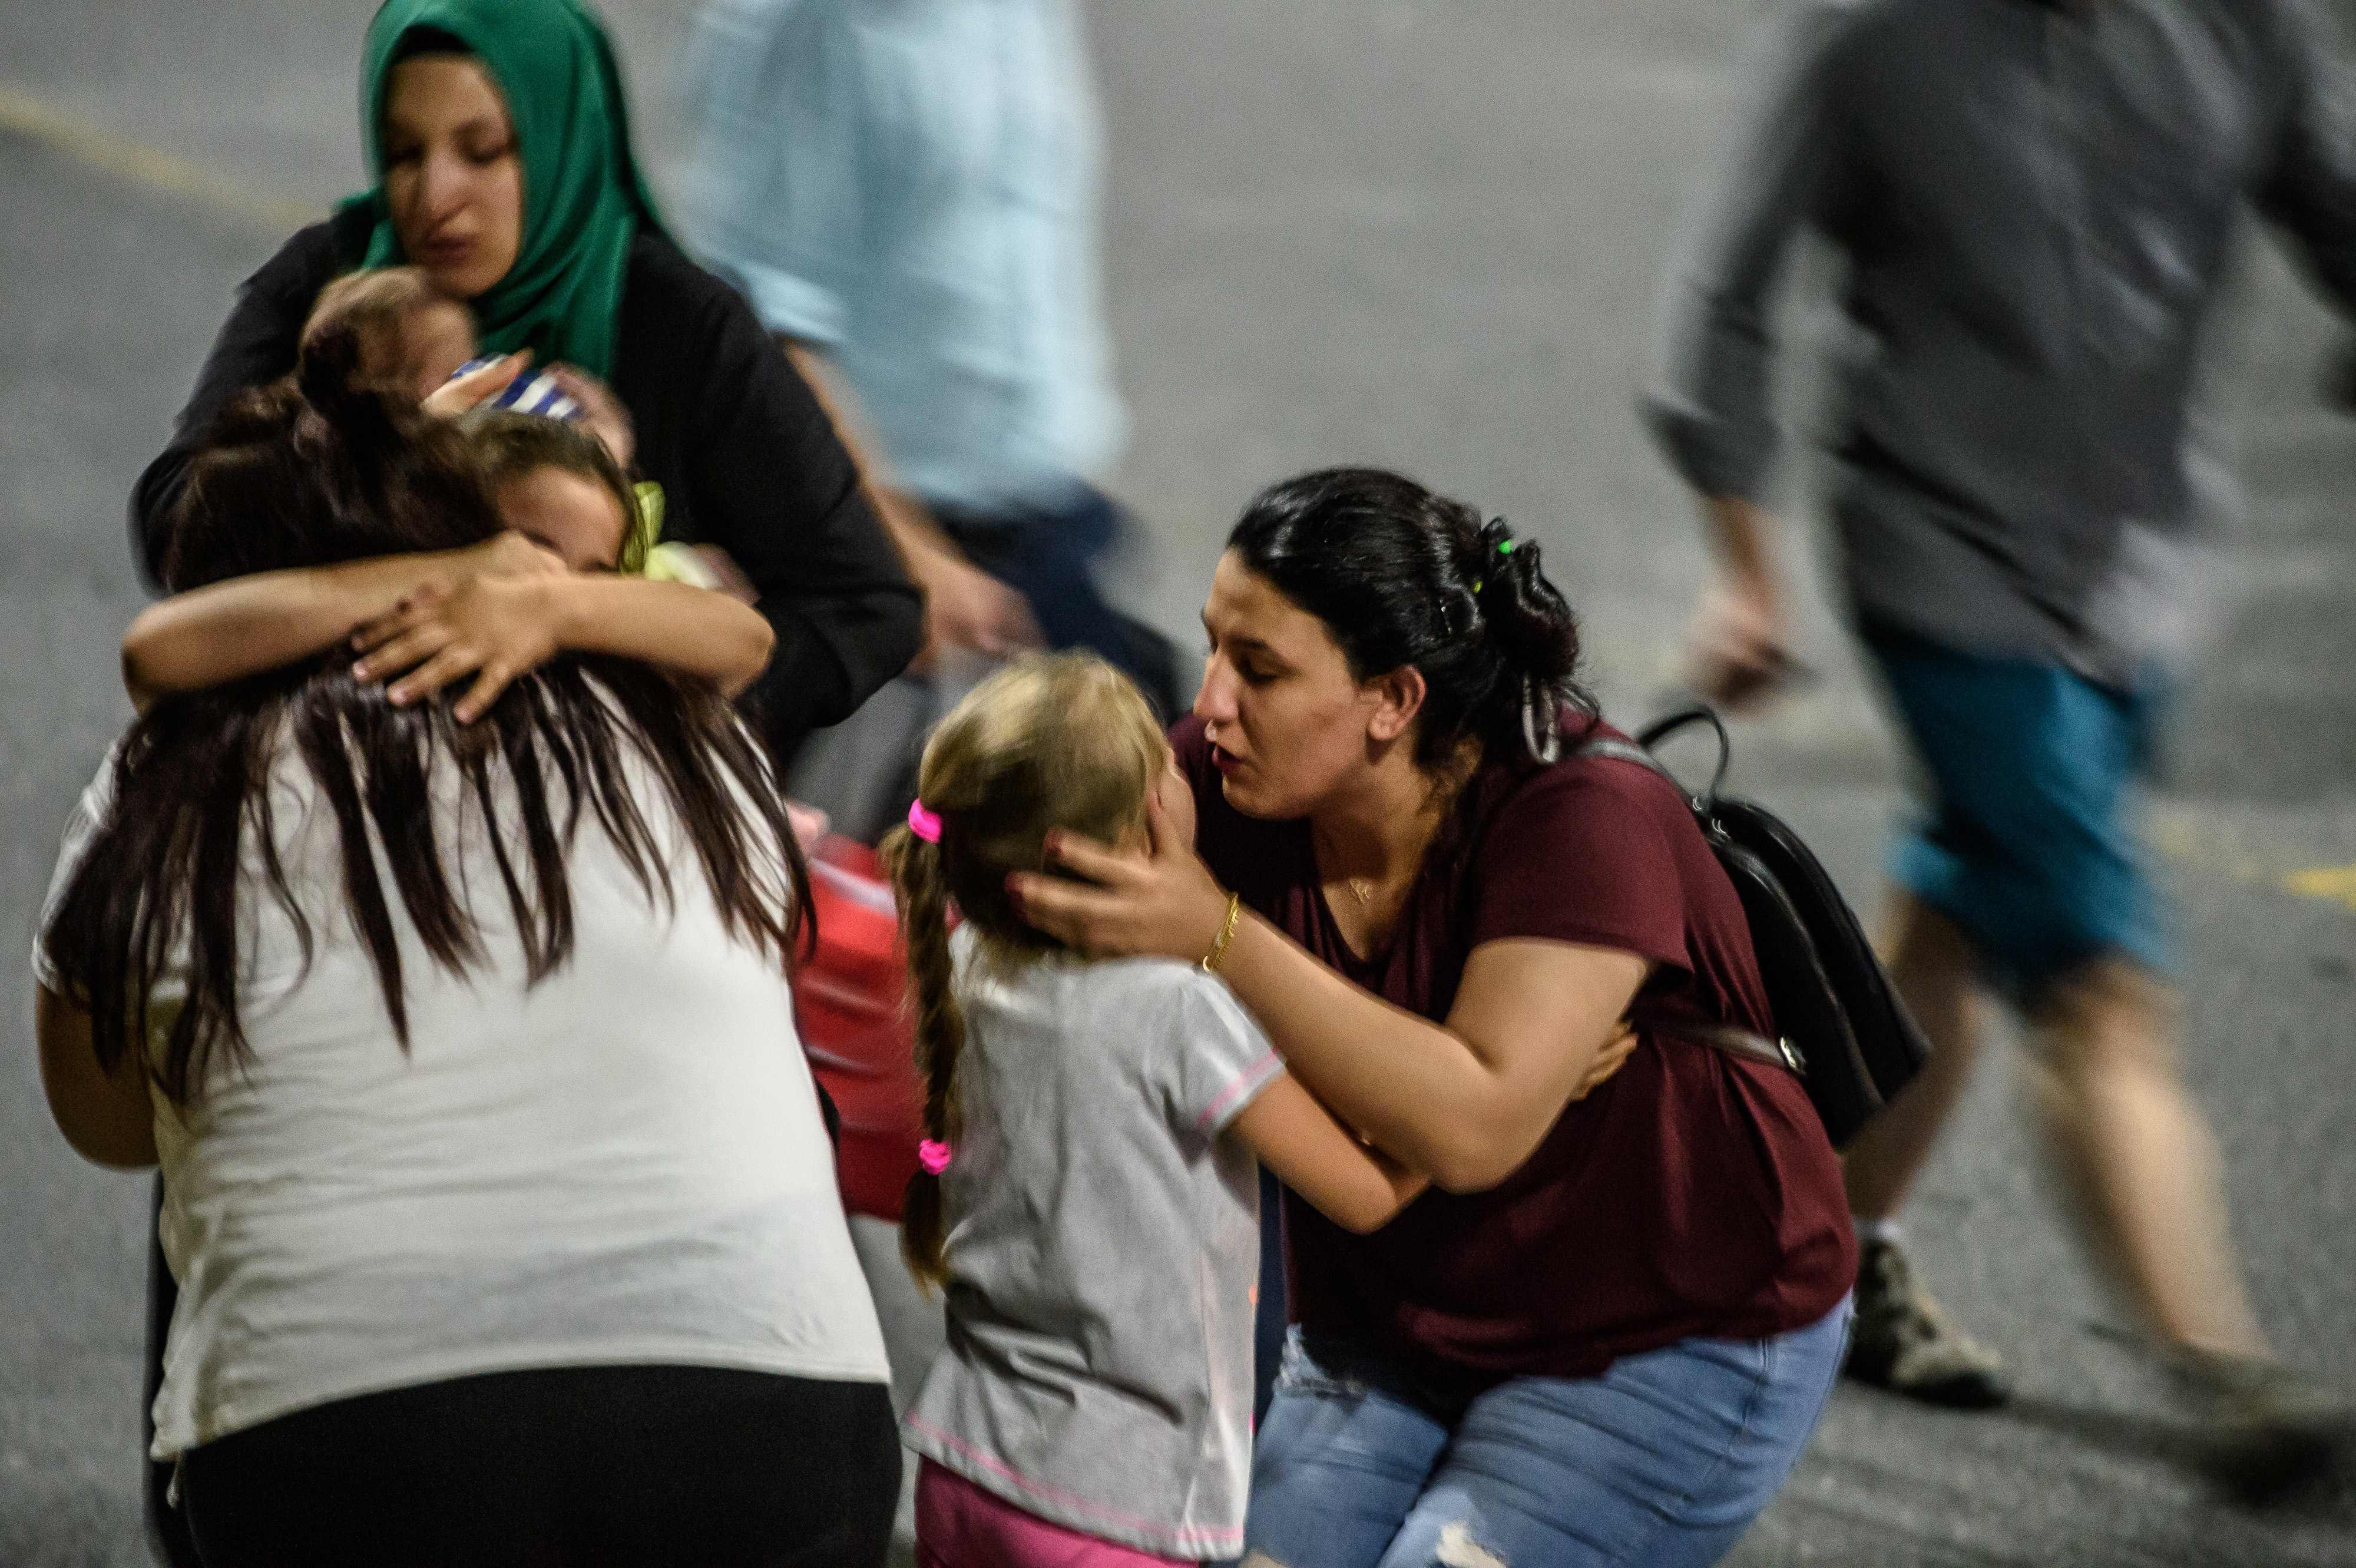 Oman condemns terrorist attack at Turkey airport